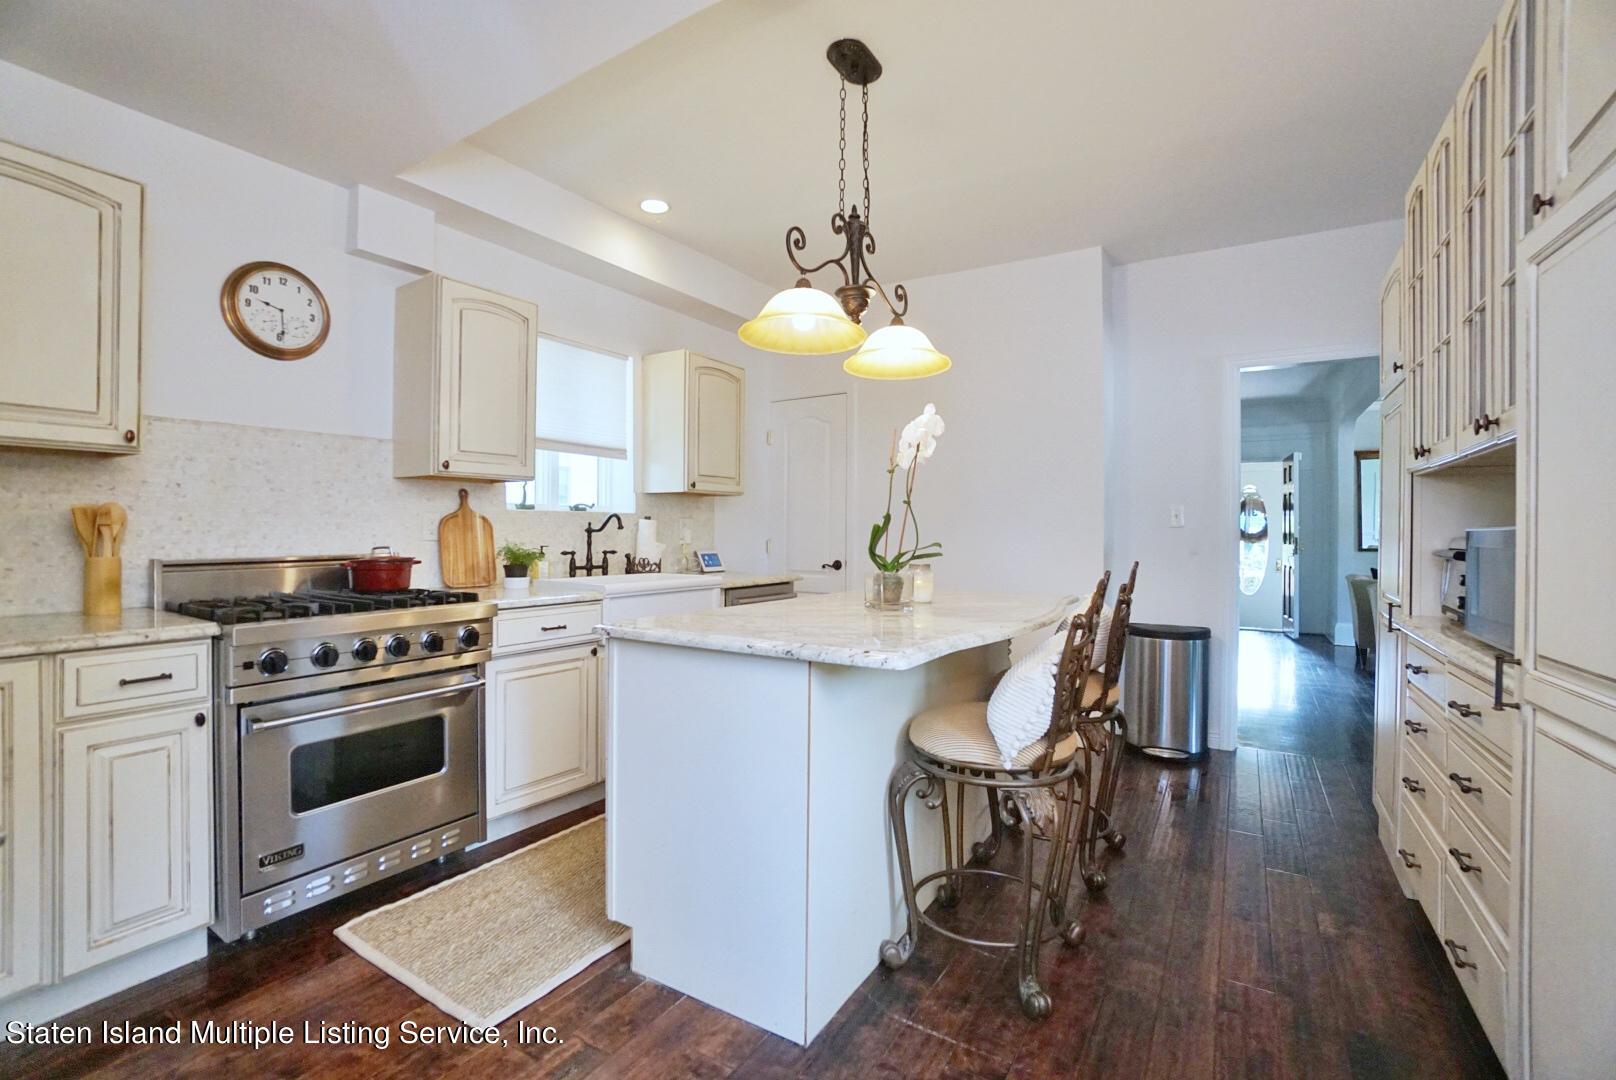 Single Family - Detached 311 Bement Avenue  Staten Island, NY 10310, MLS-1147133-17